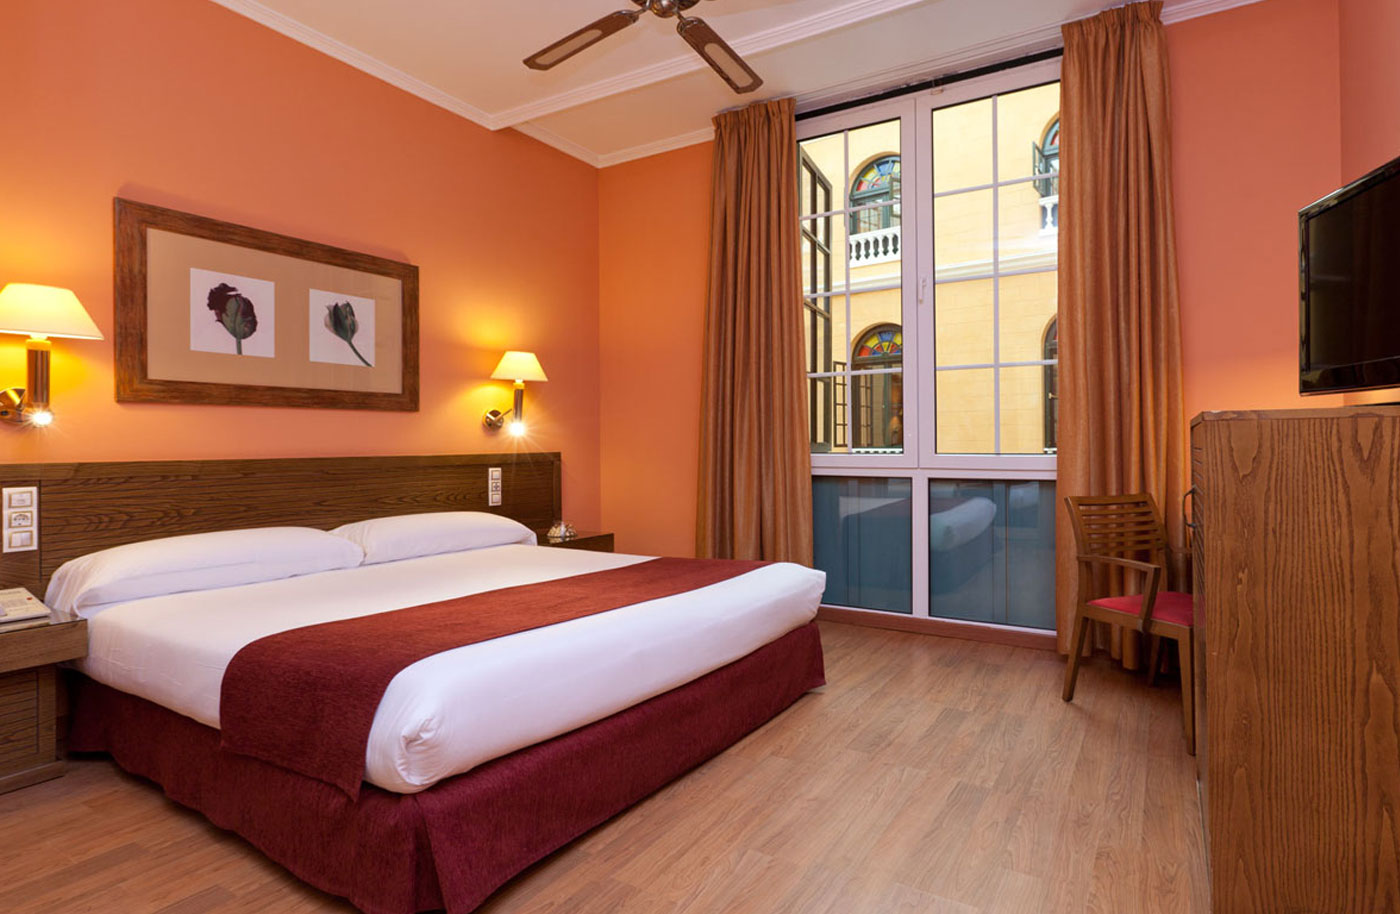 Rooms senator c diz spa hotel official website for Habitaciones para hoteles